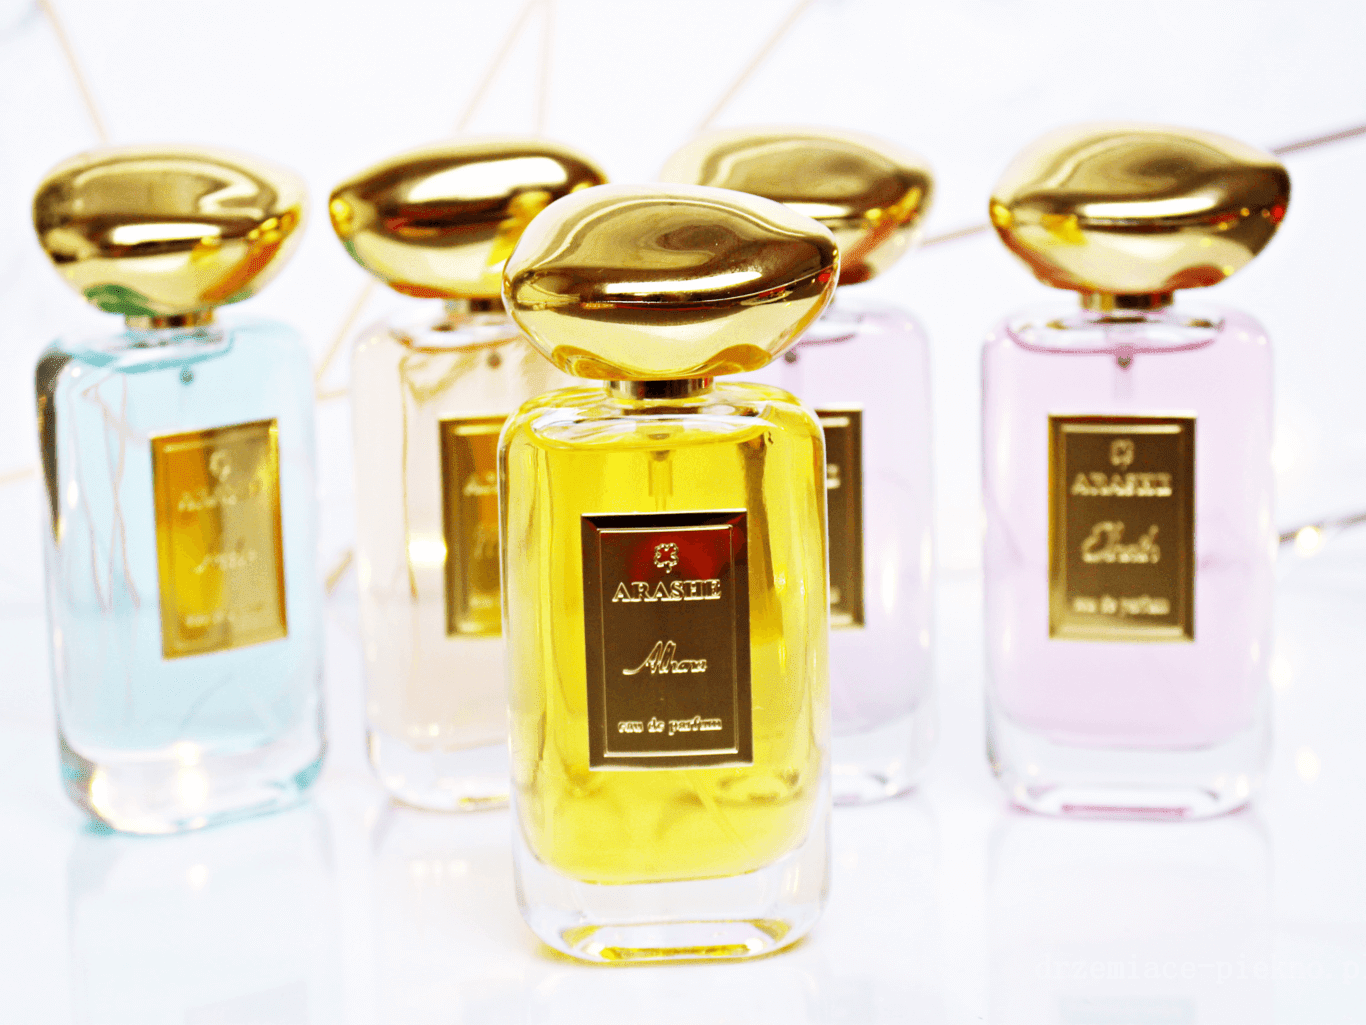 Perfumy Arashe Alhena, Elnath, Hadar, Misam oraz Shaula.